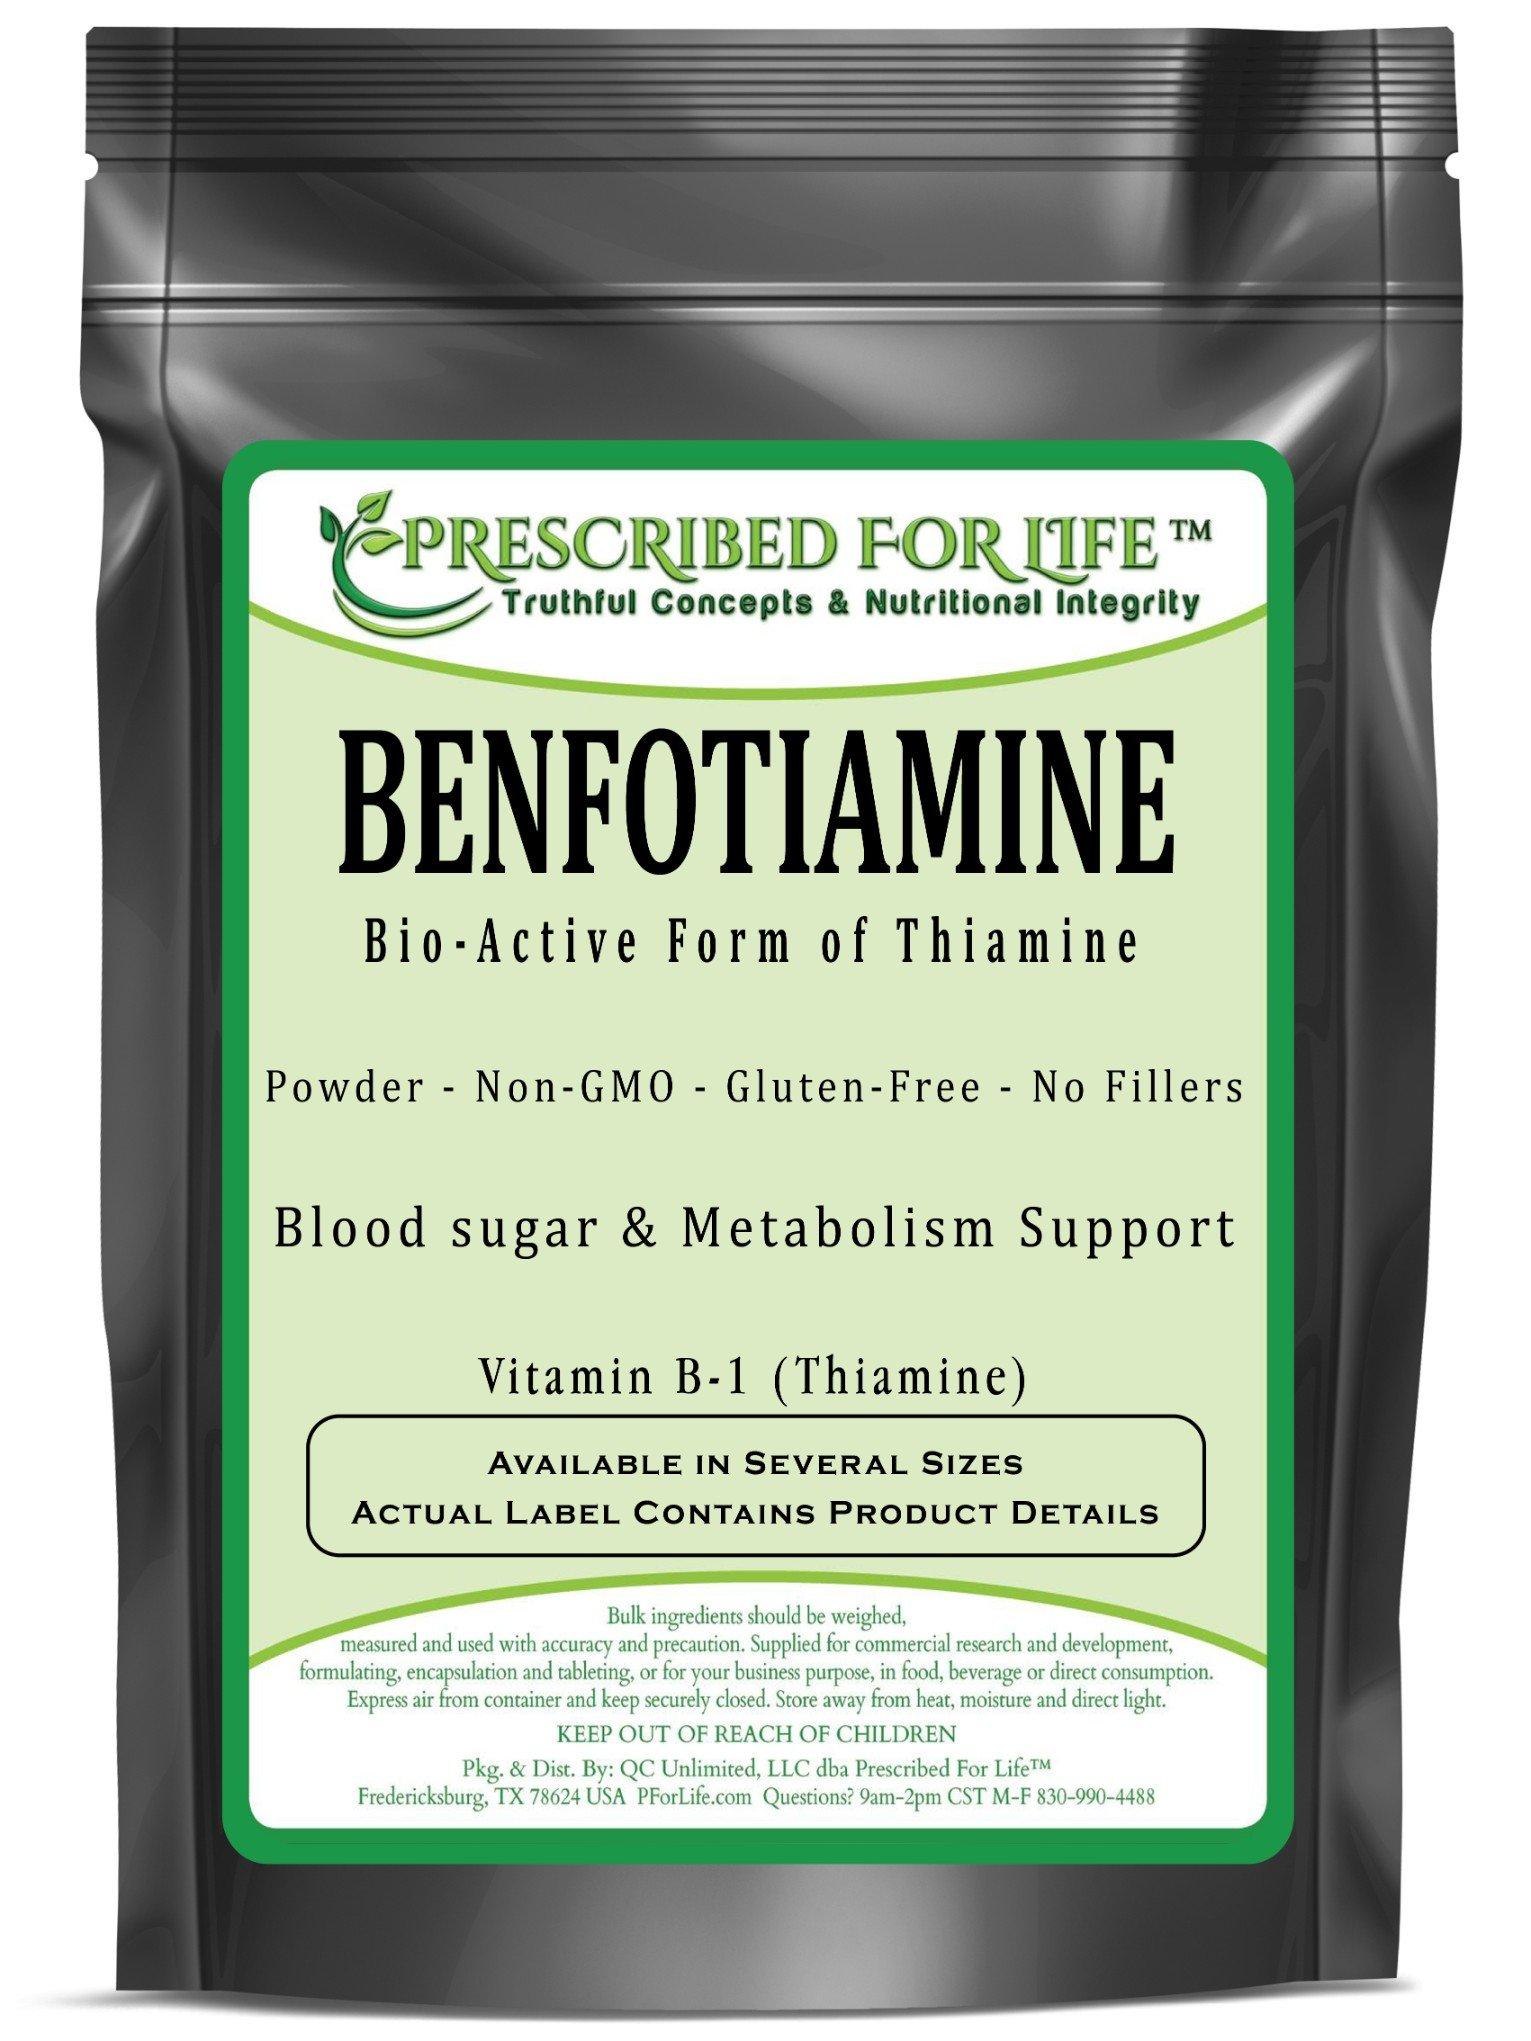 Benfotiamine - BioActive Form of Thiamine - Vitamin B-1 Powder, 12 oz